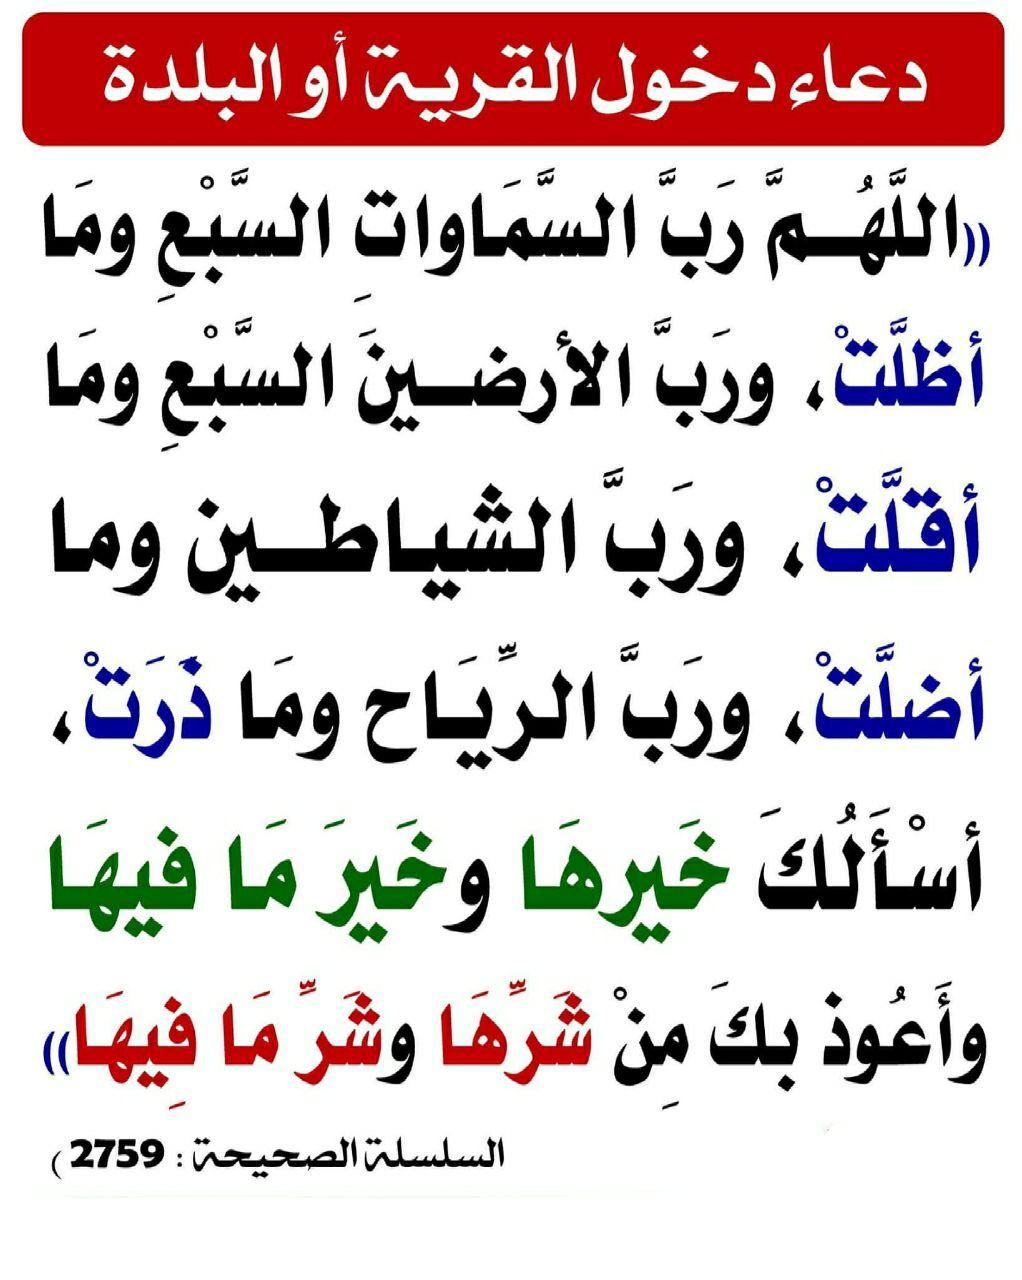 Pin By الأثر الجميل On دعاء Prayers Arabic Calligraphy Dua